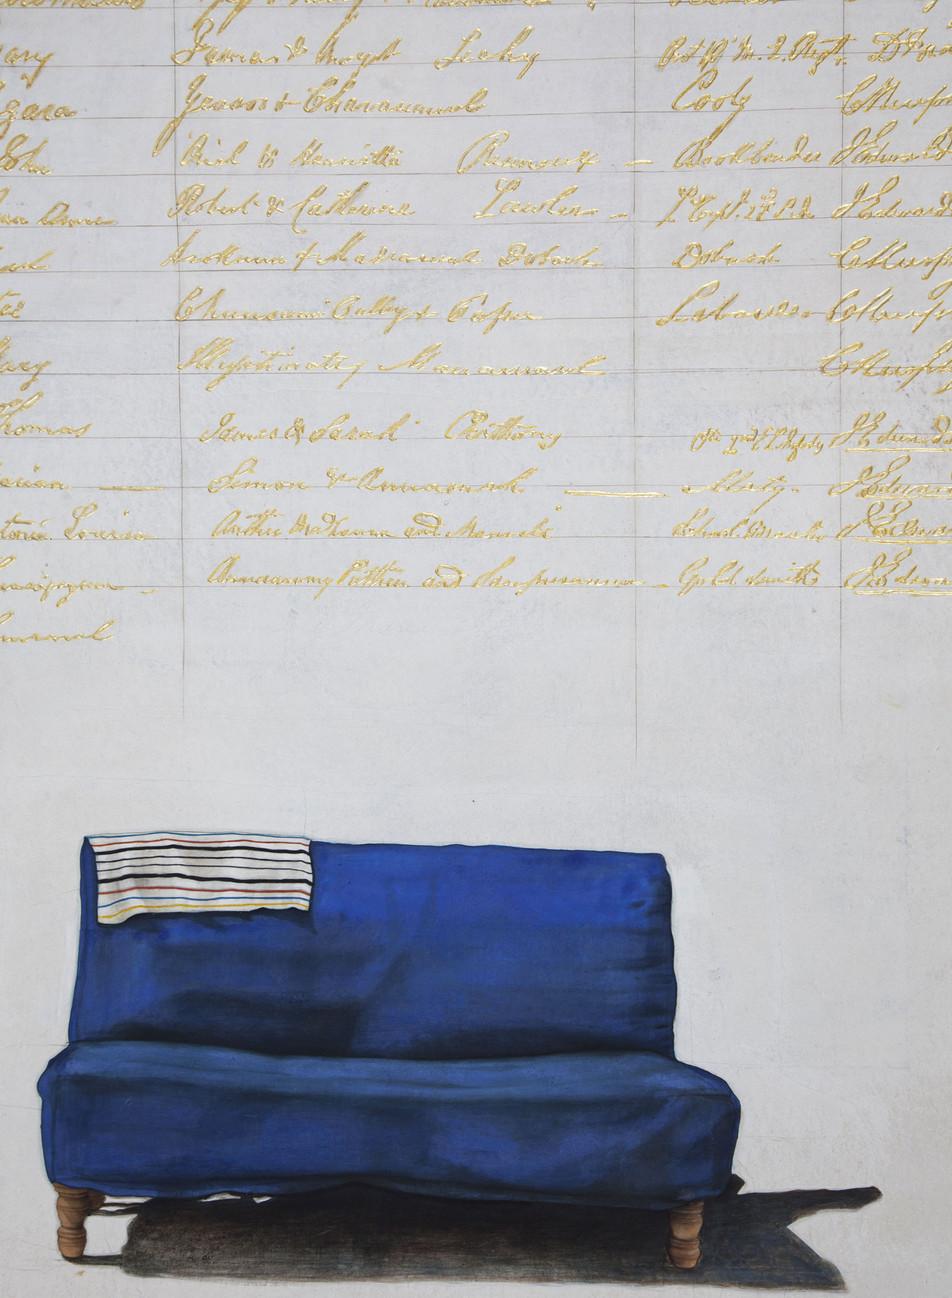 Baptisme Certificat detail I